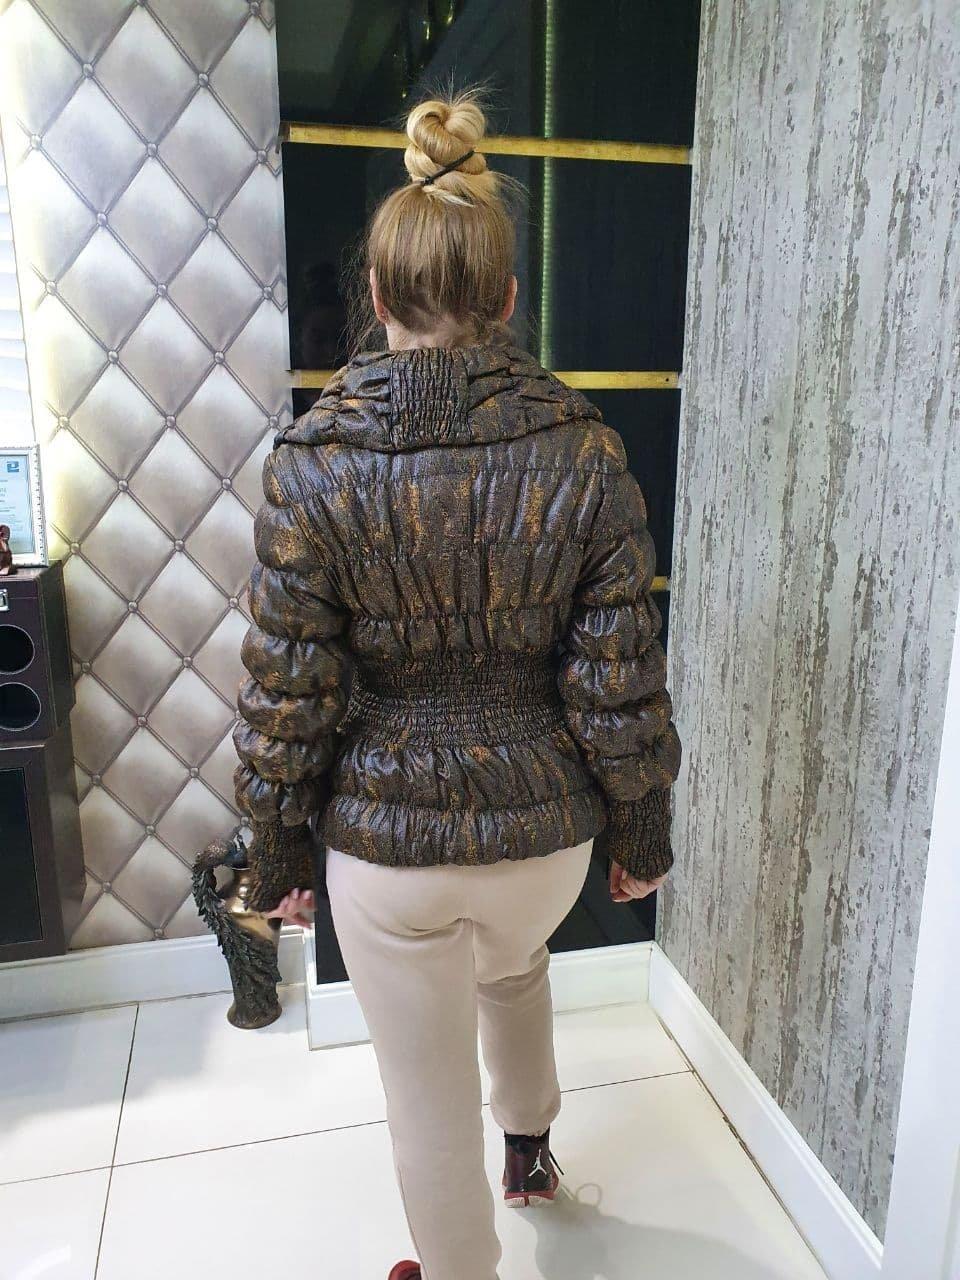 Куртка Весна Резинка 10720 АРТ. 47156 Цвет: Горчица - фото 2, интернет магазин tm-modus.ru